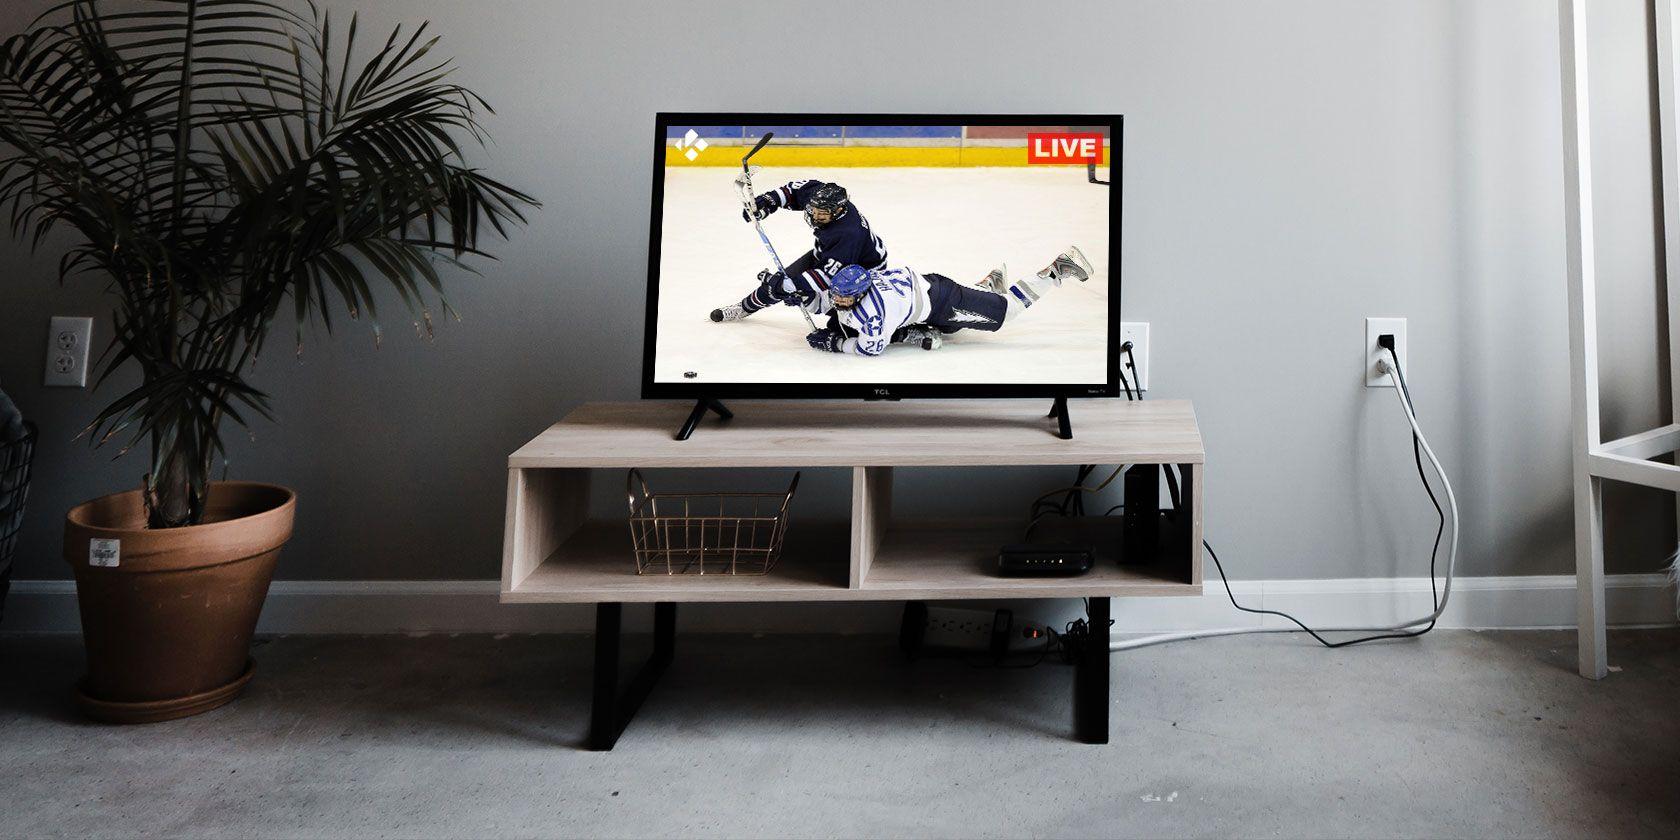 How to Watch Live TV on Kodi